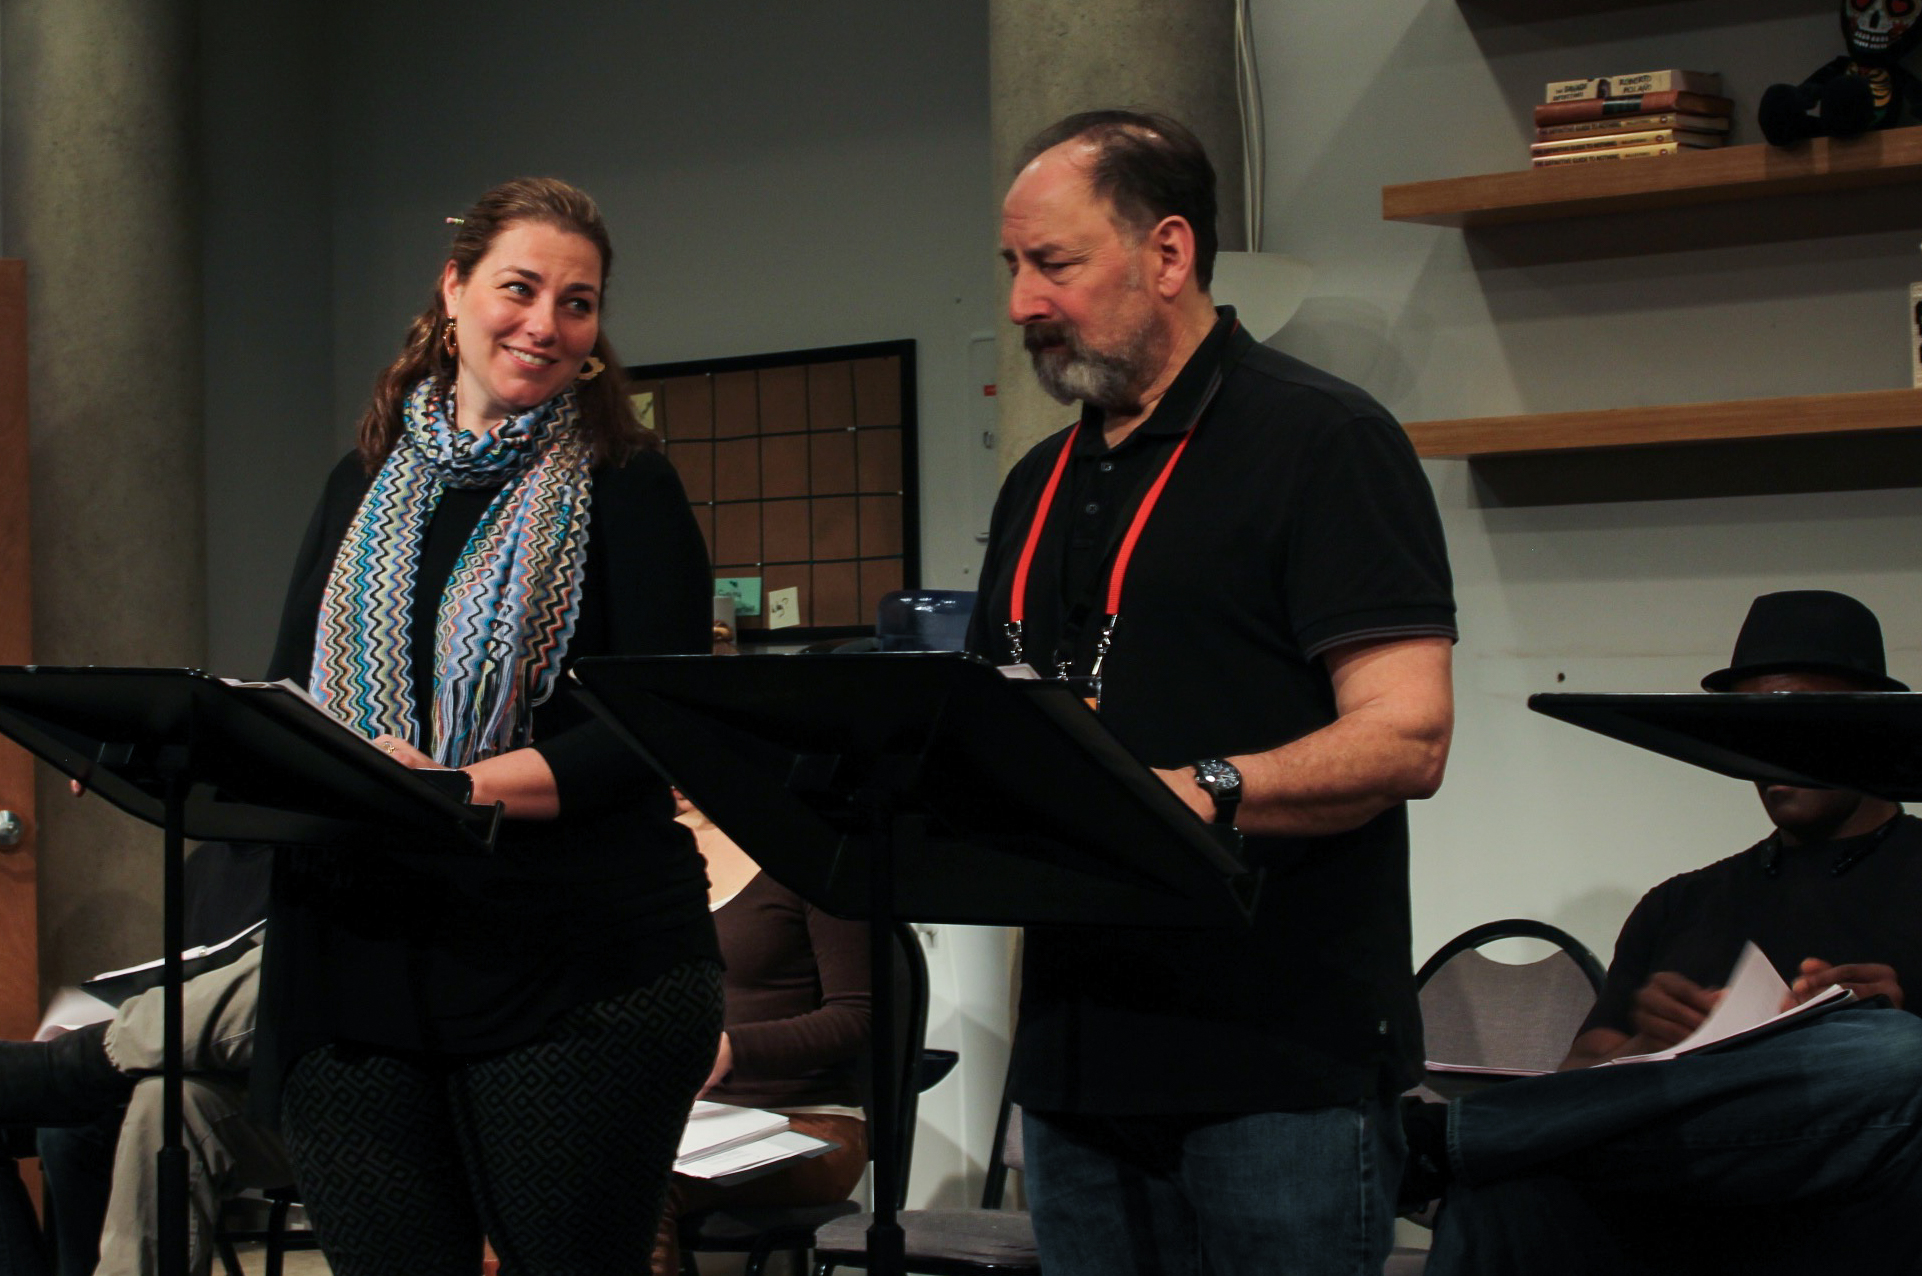 Susan Shay & Arye Gross as Rebecca & John Heminges